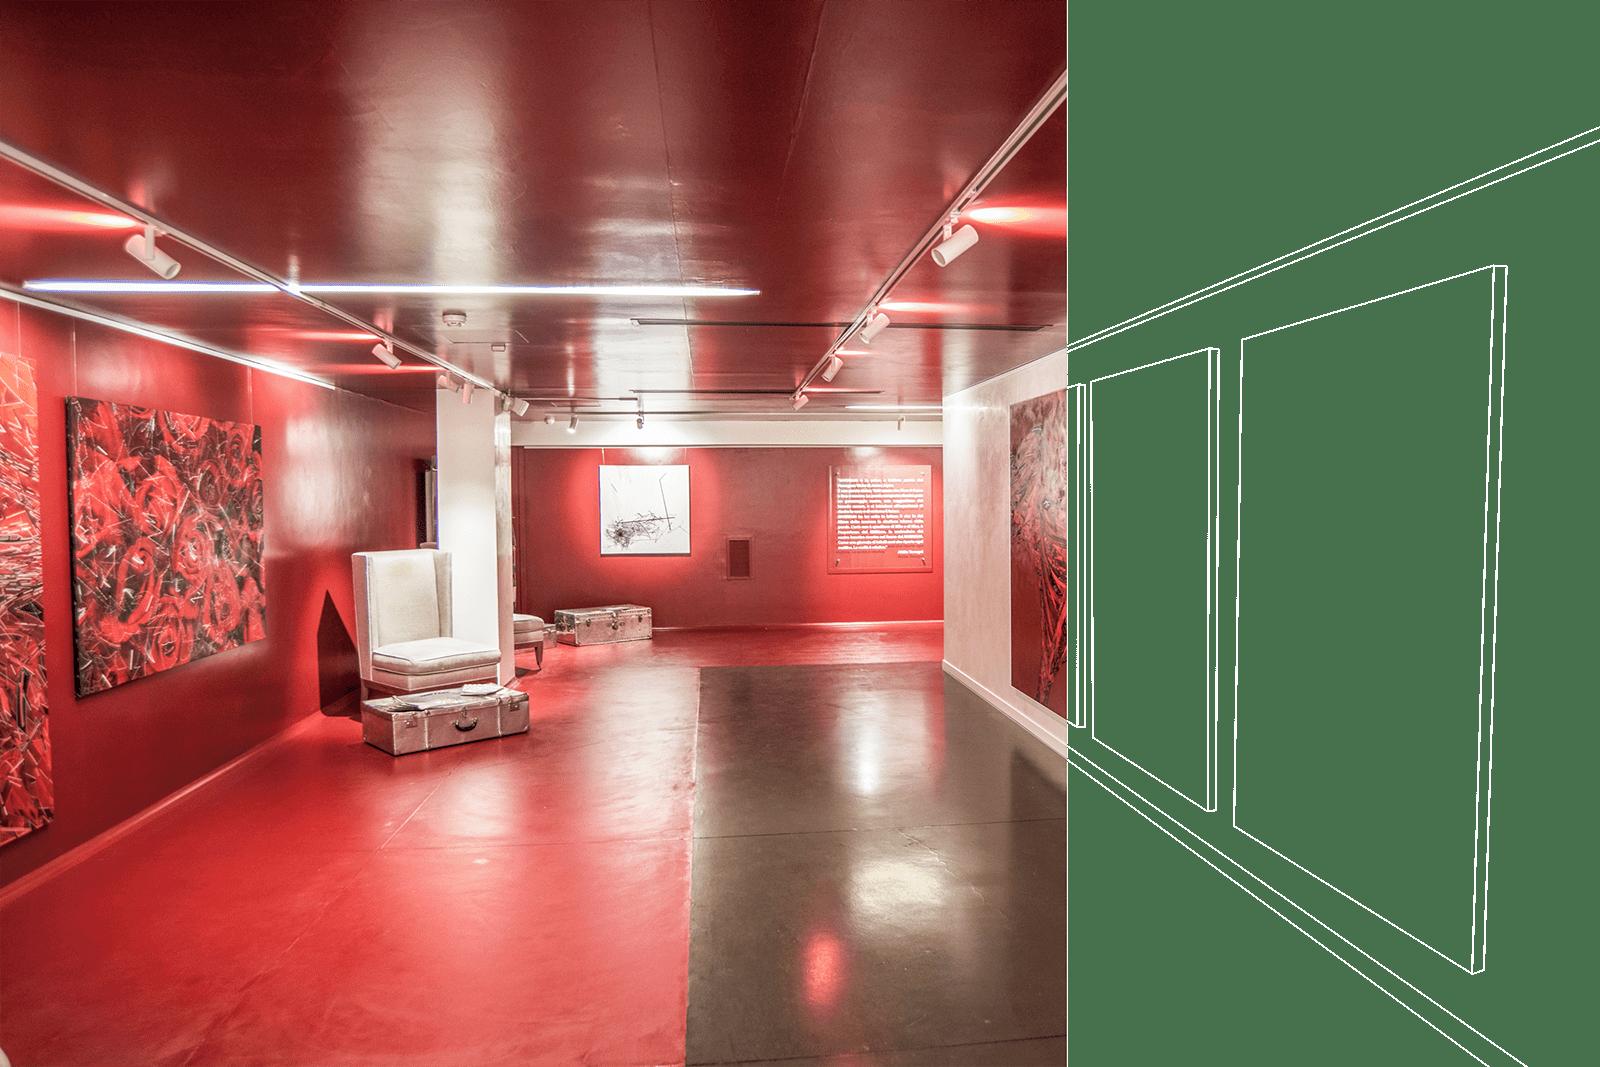 HUB/ART Gallery